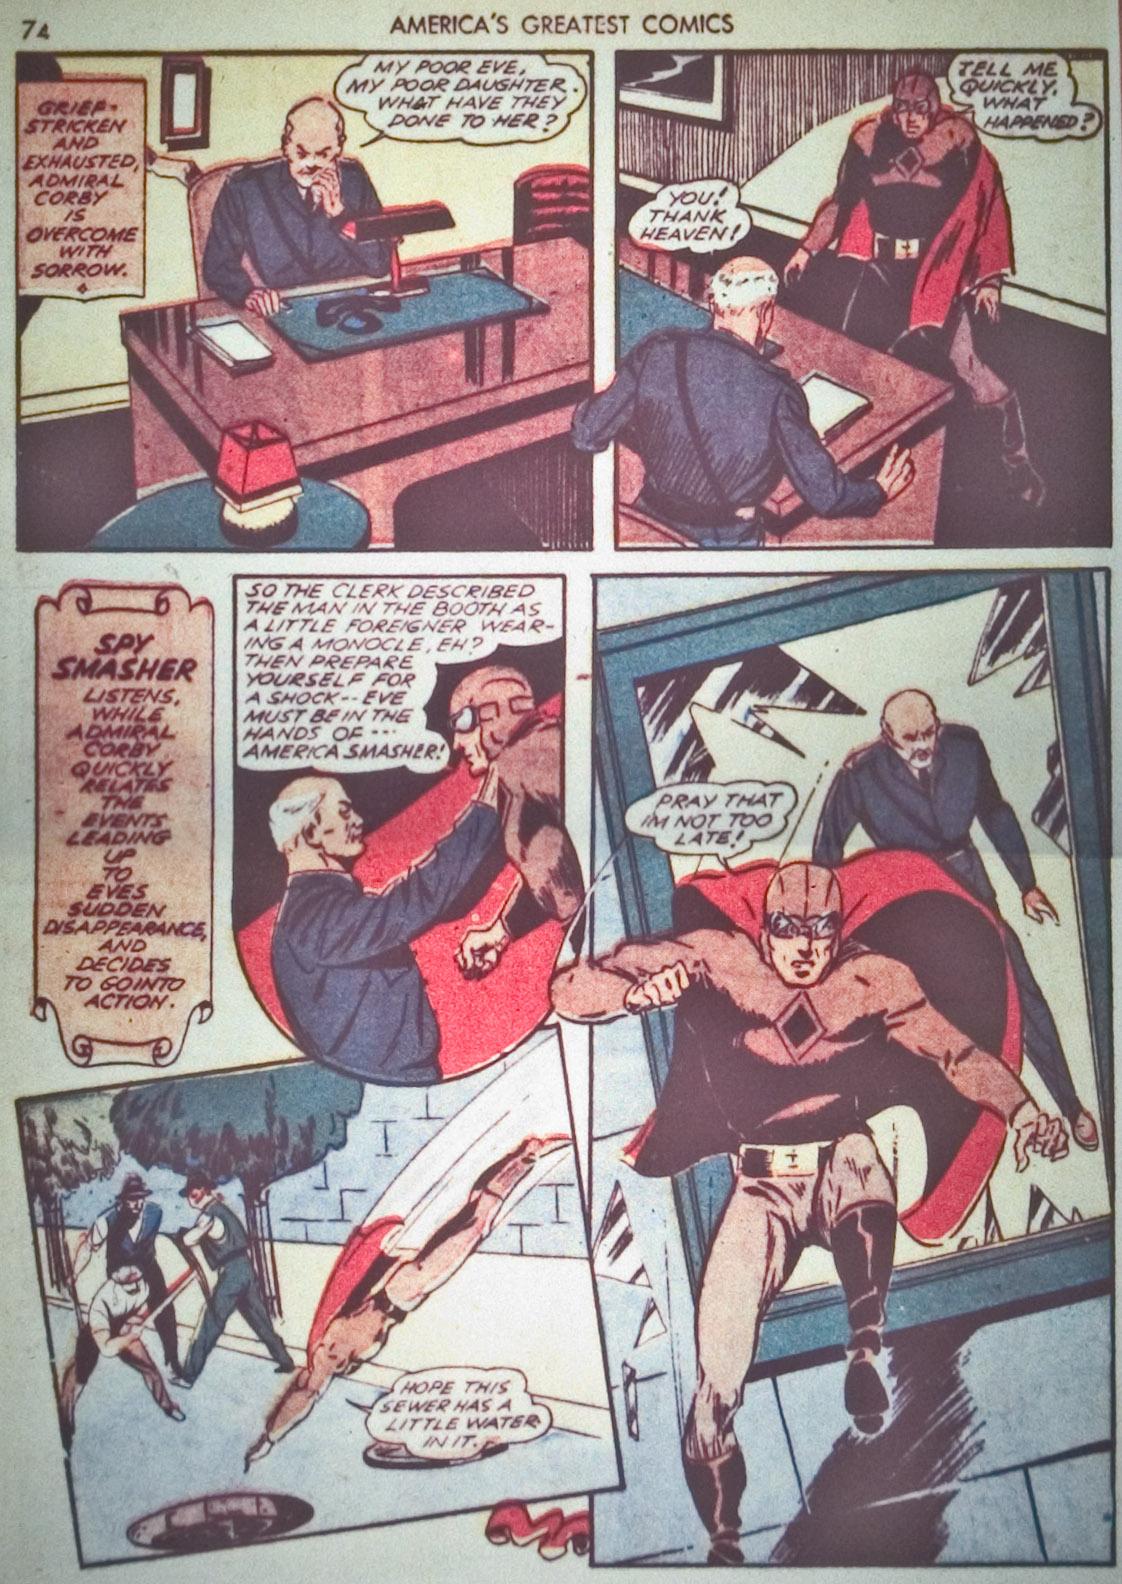 Read online America's Greatest Comics comic -  Issue #1 - 77